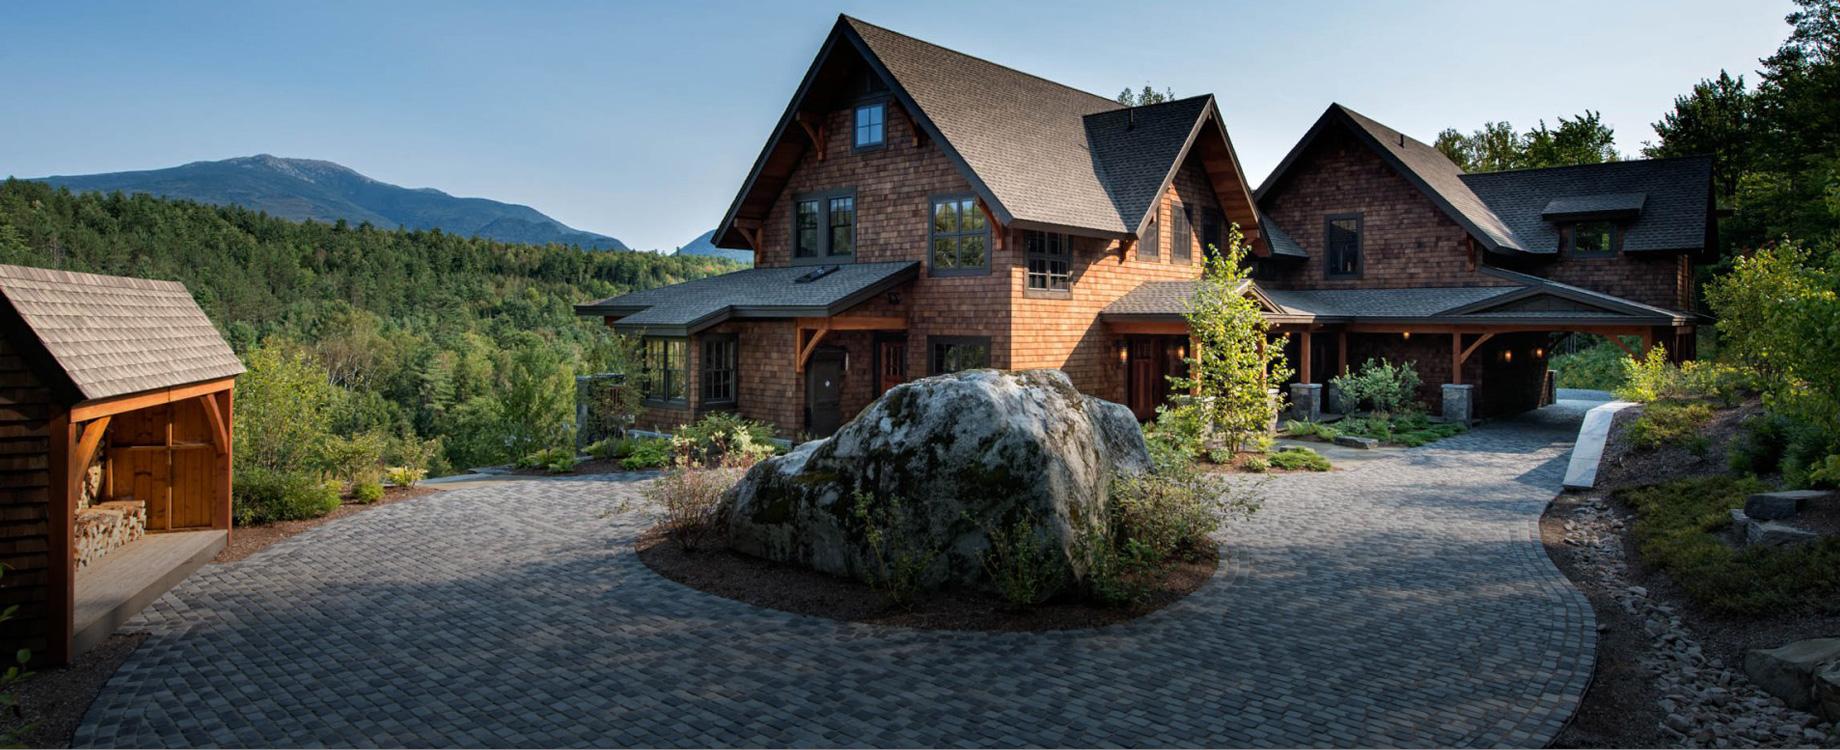 Nh Landscape Architects